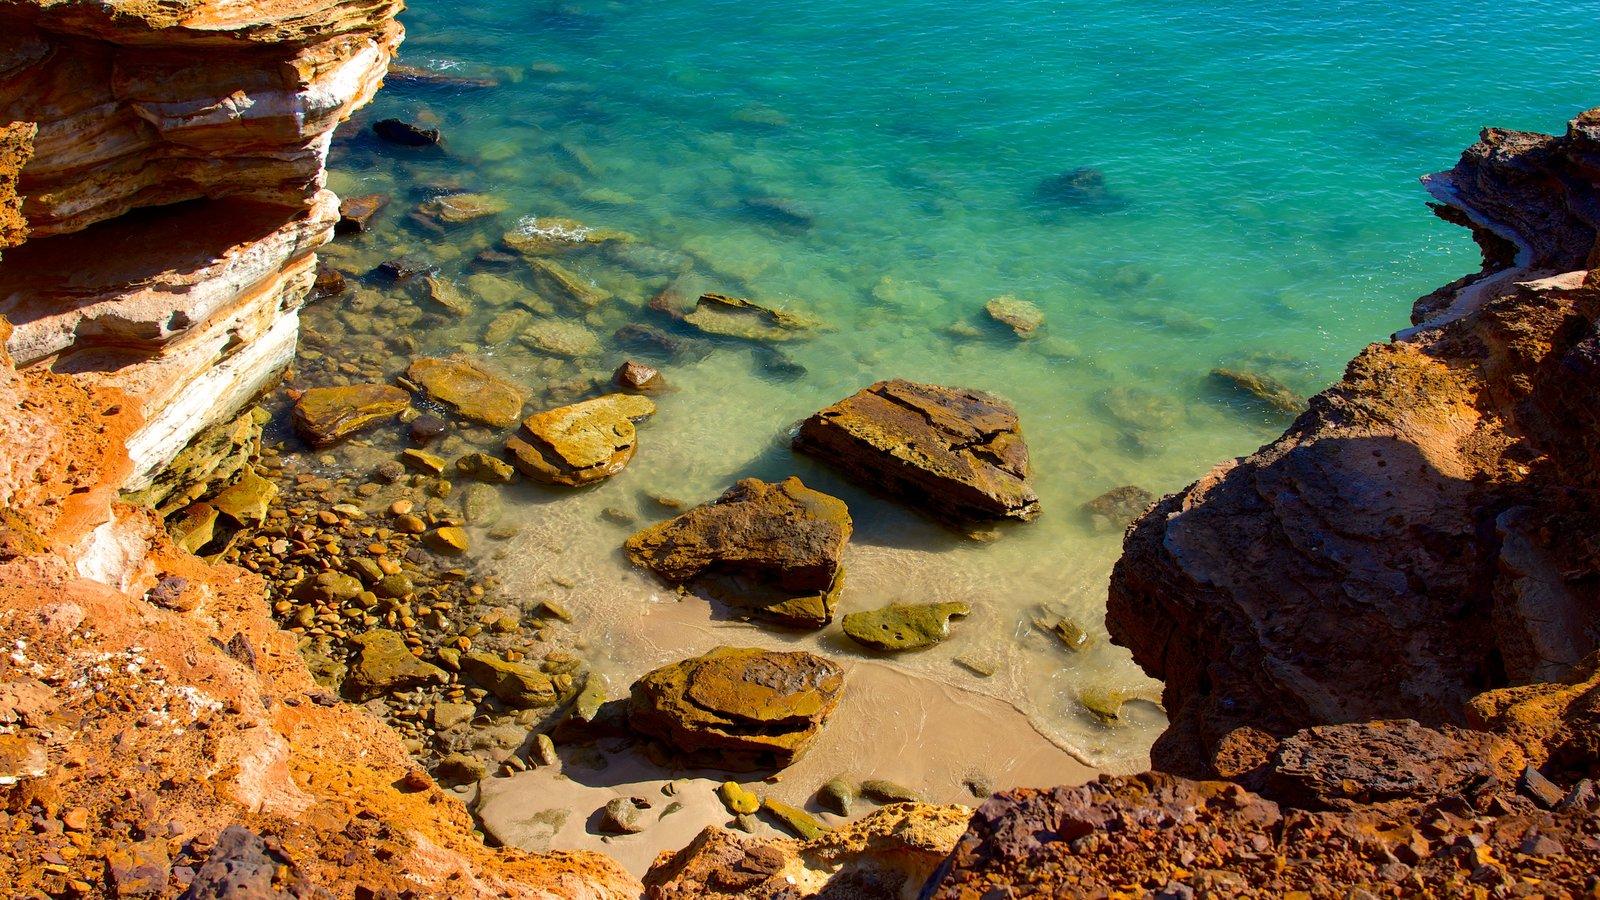 Gantheaume Point showing rocky coastline and landscape views